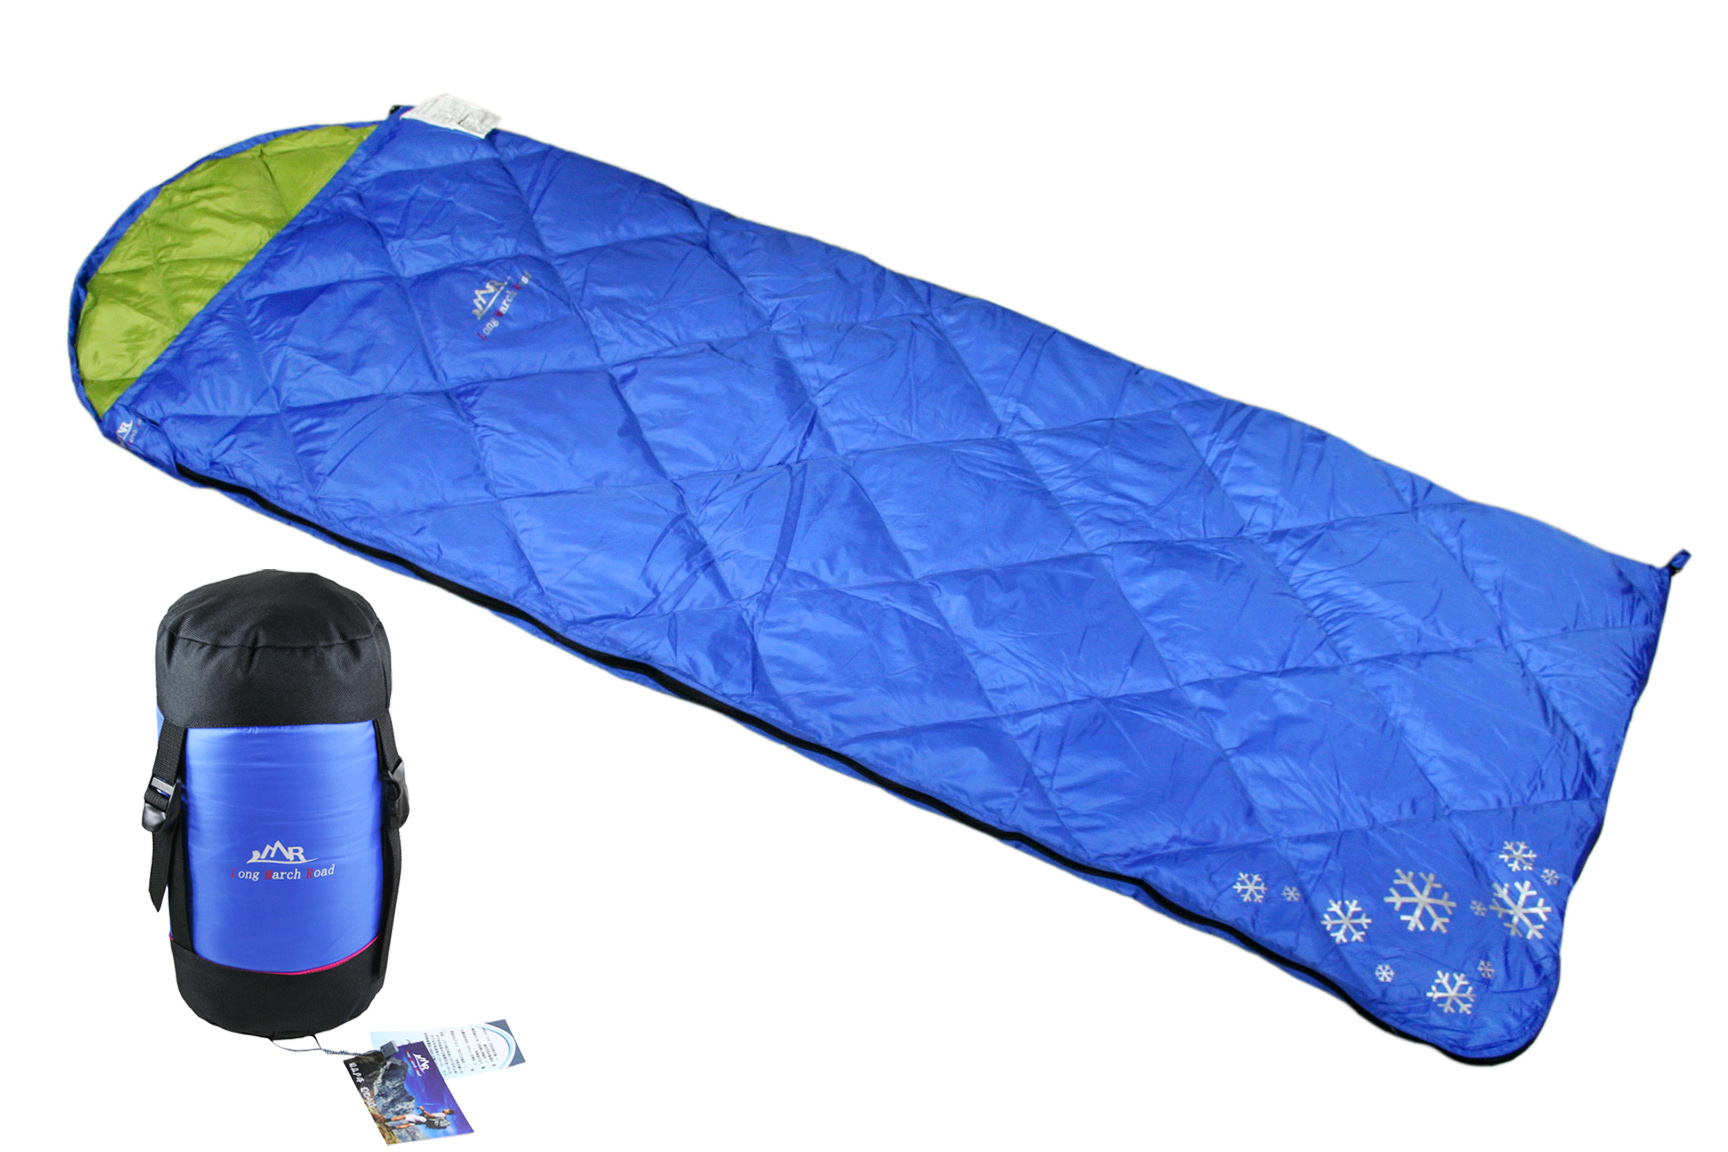 LMR征途/雪山蝠信封式羽绒睡袋含绒量90%白鸭绒400克直销包邮春秋